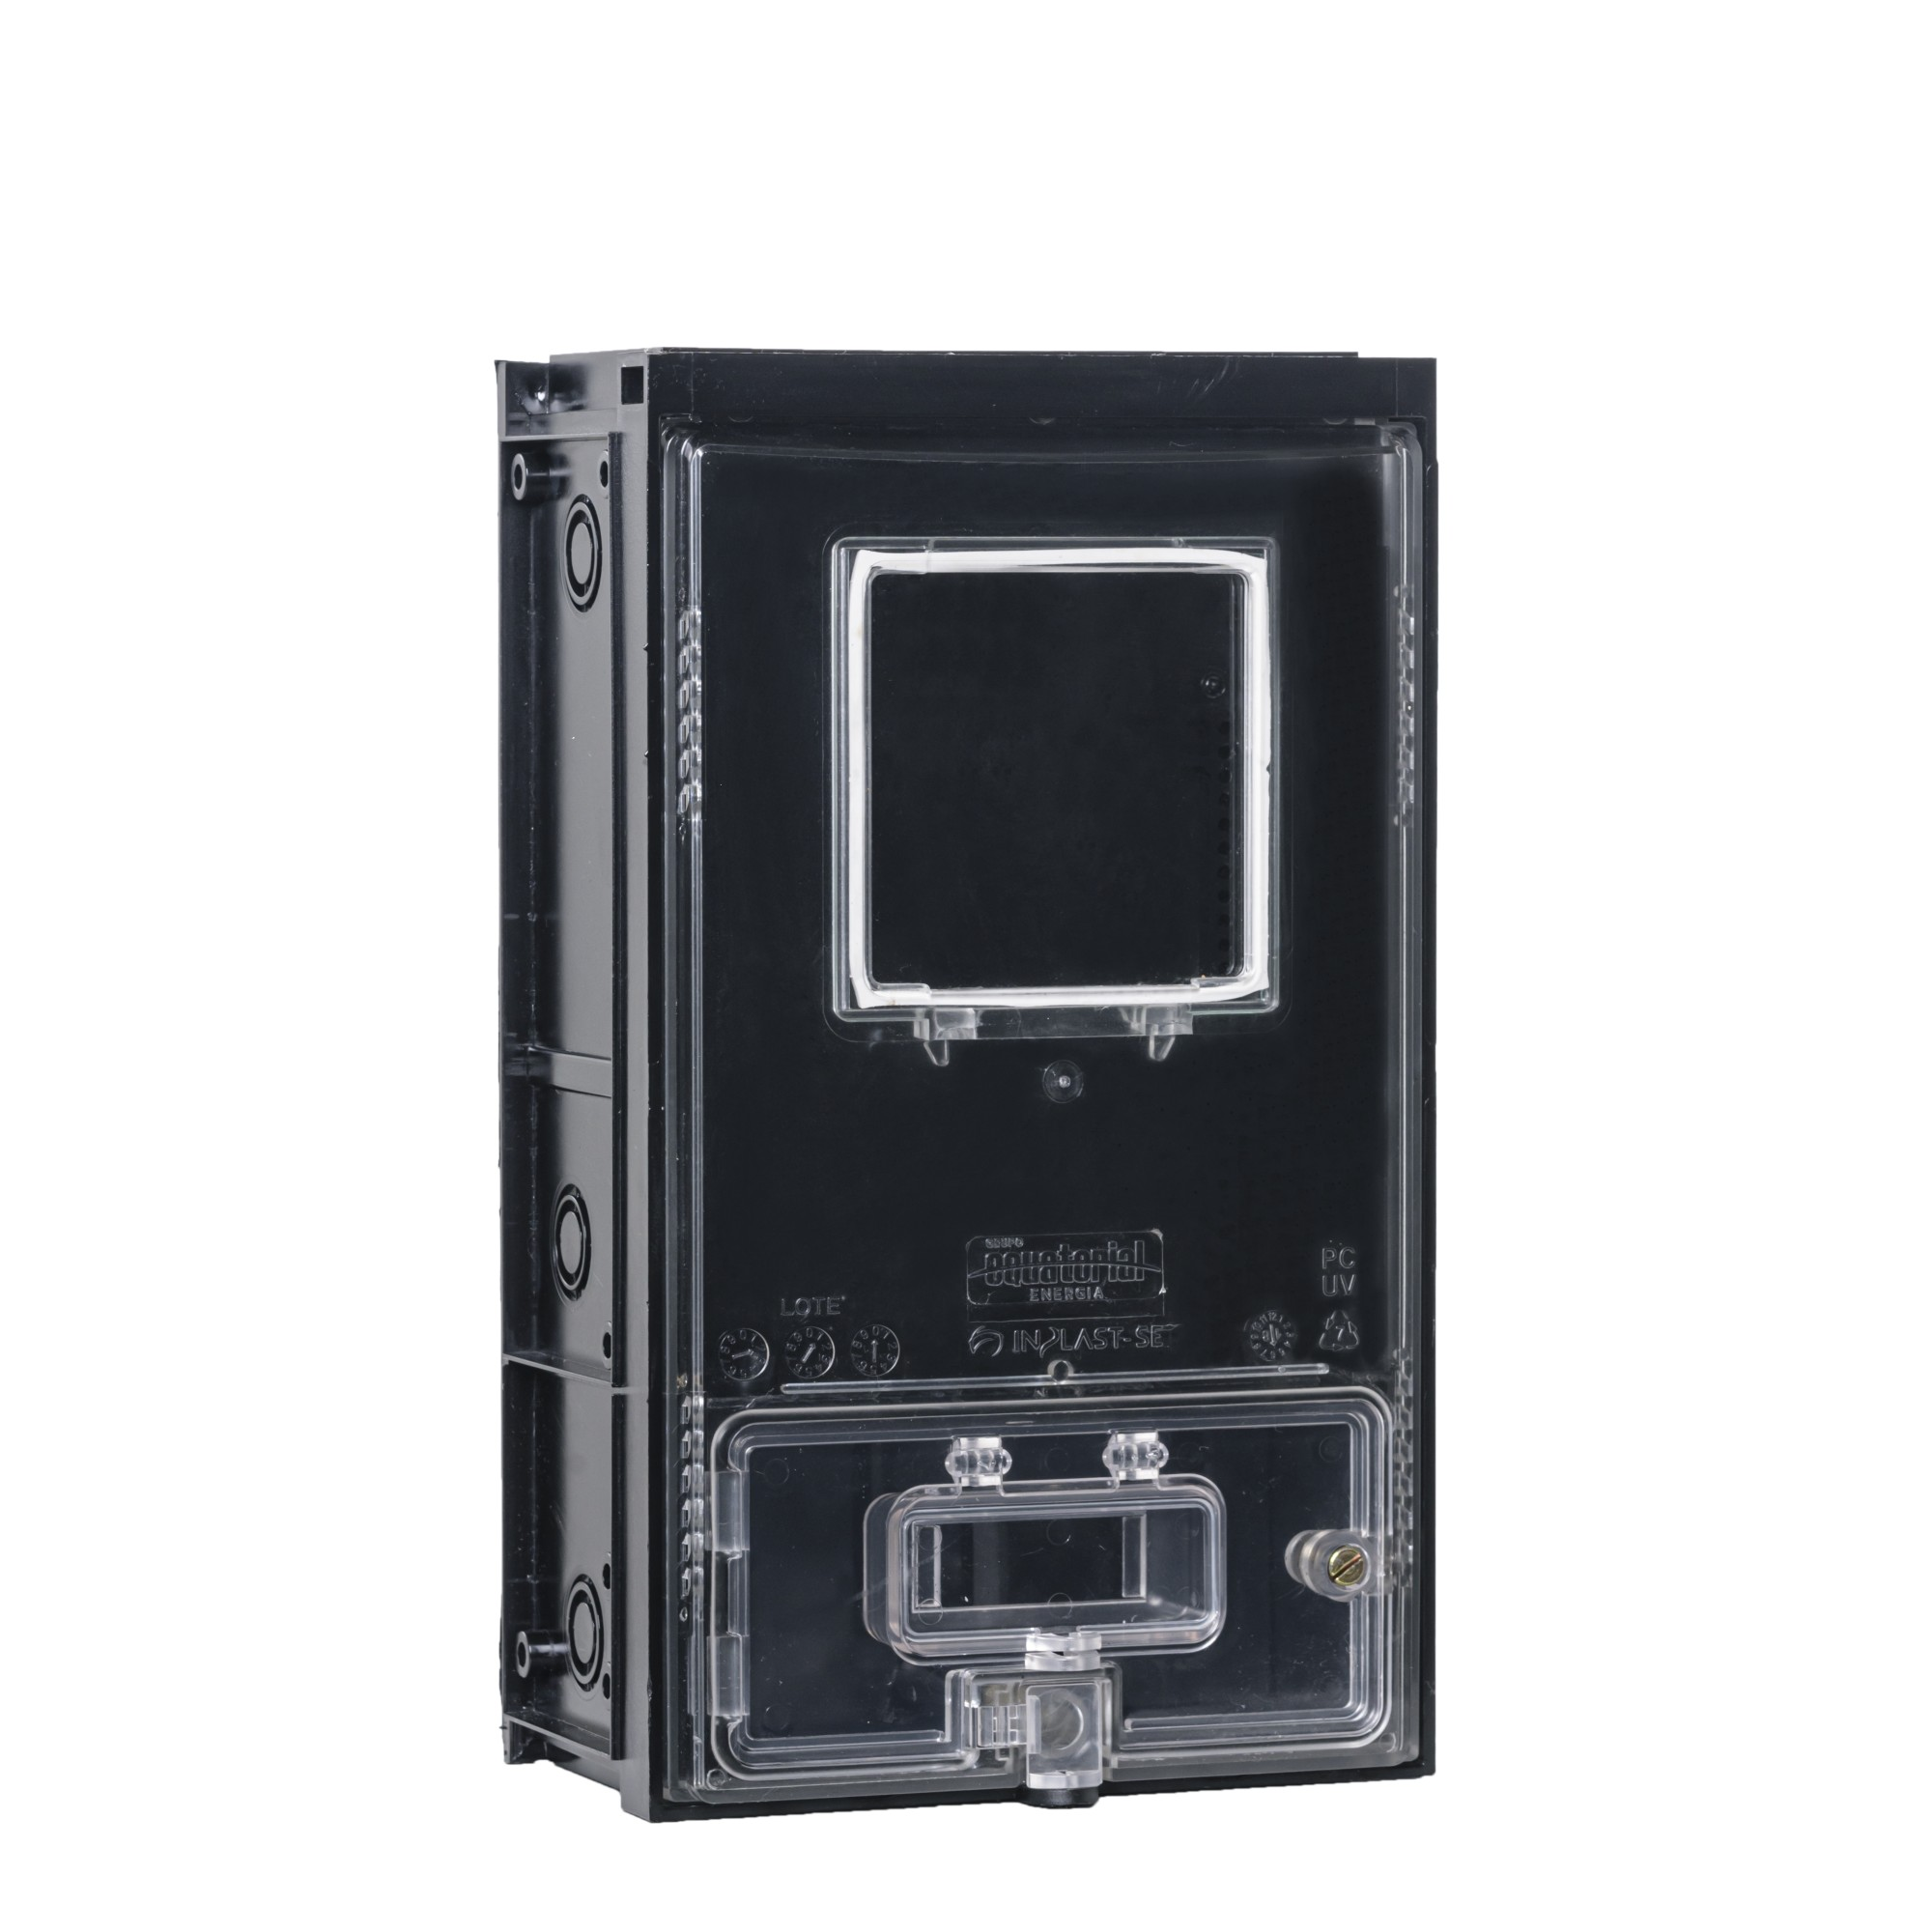 Quadro de Medicao Monofasica Caixa para Disjuntor Neoenergia - Inplast